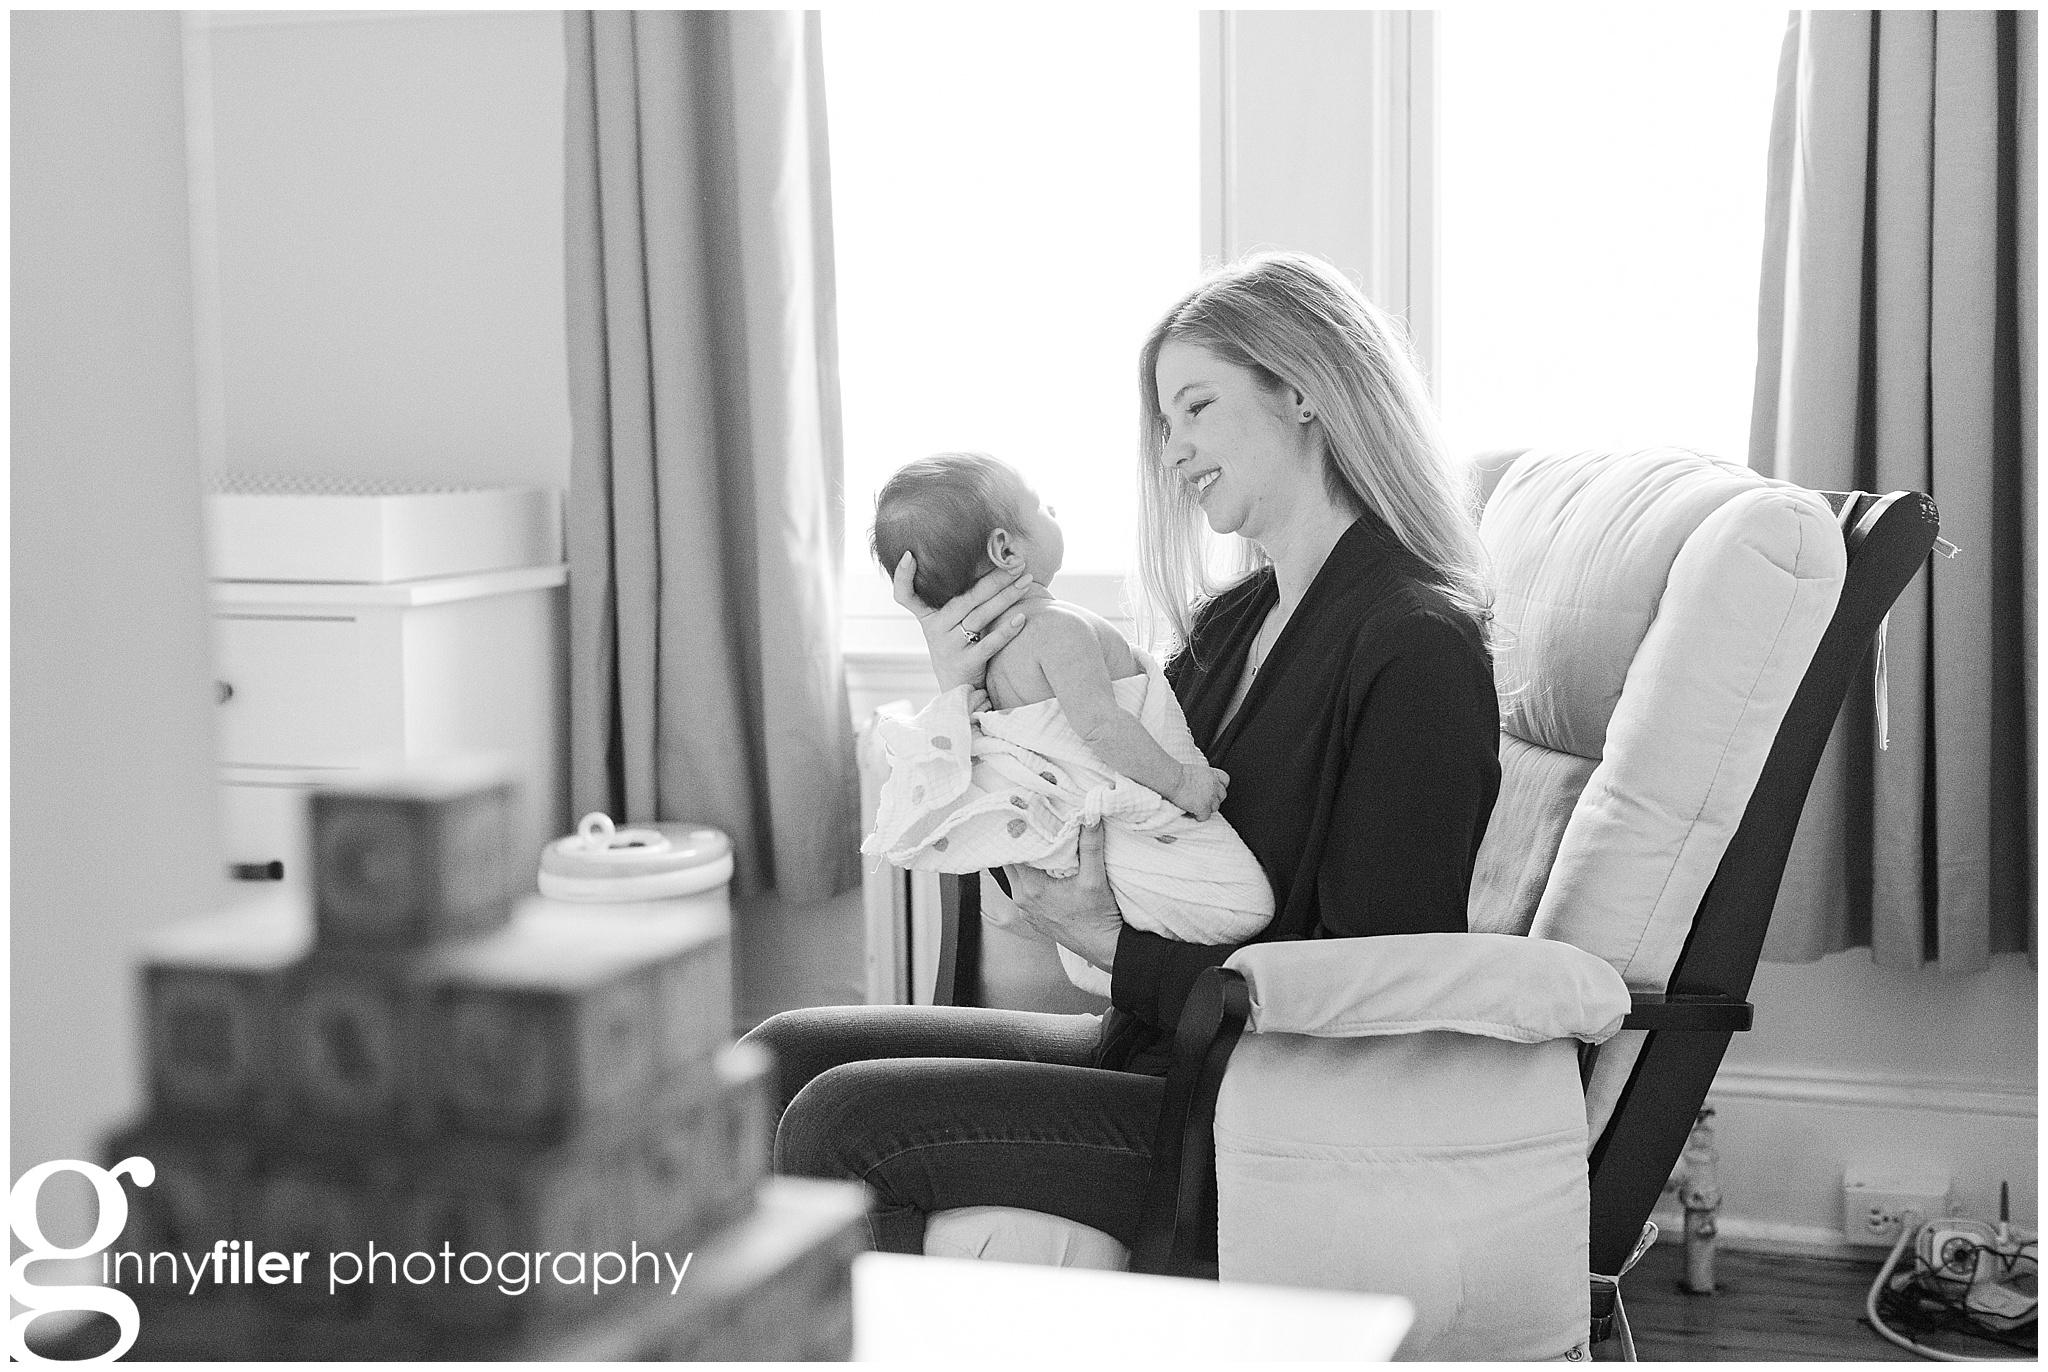 newborn_photography_Cullen_0010.jpg